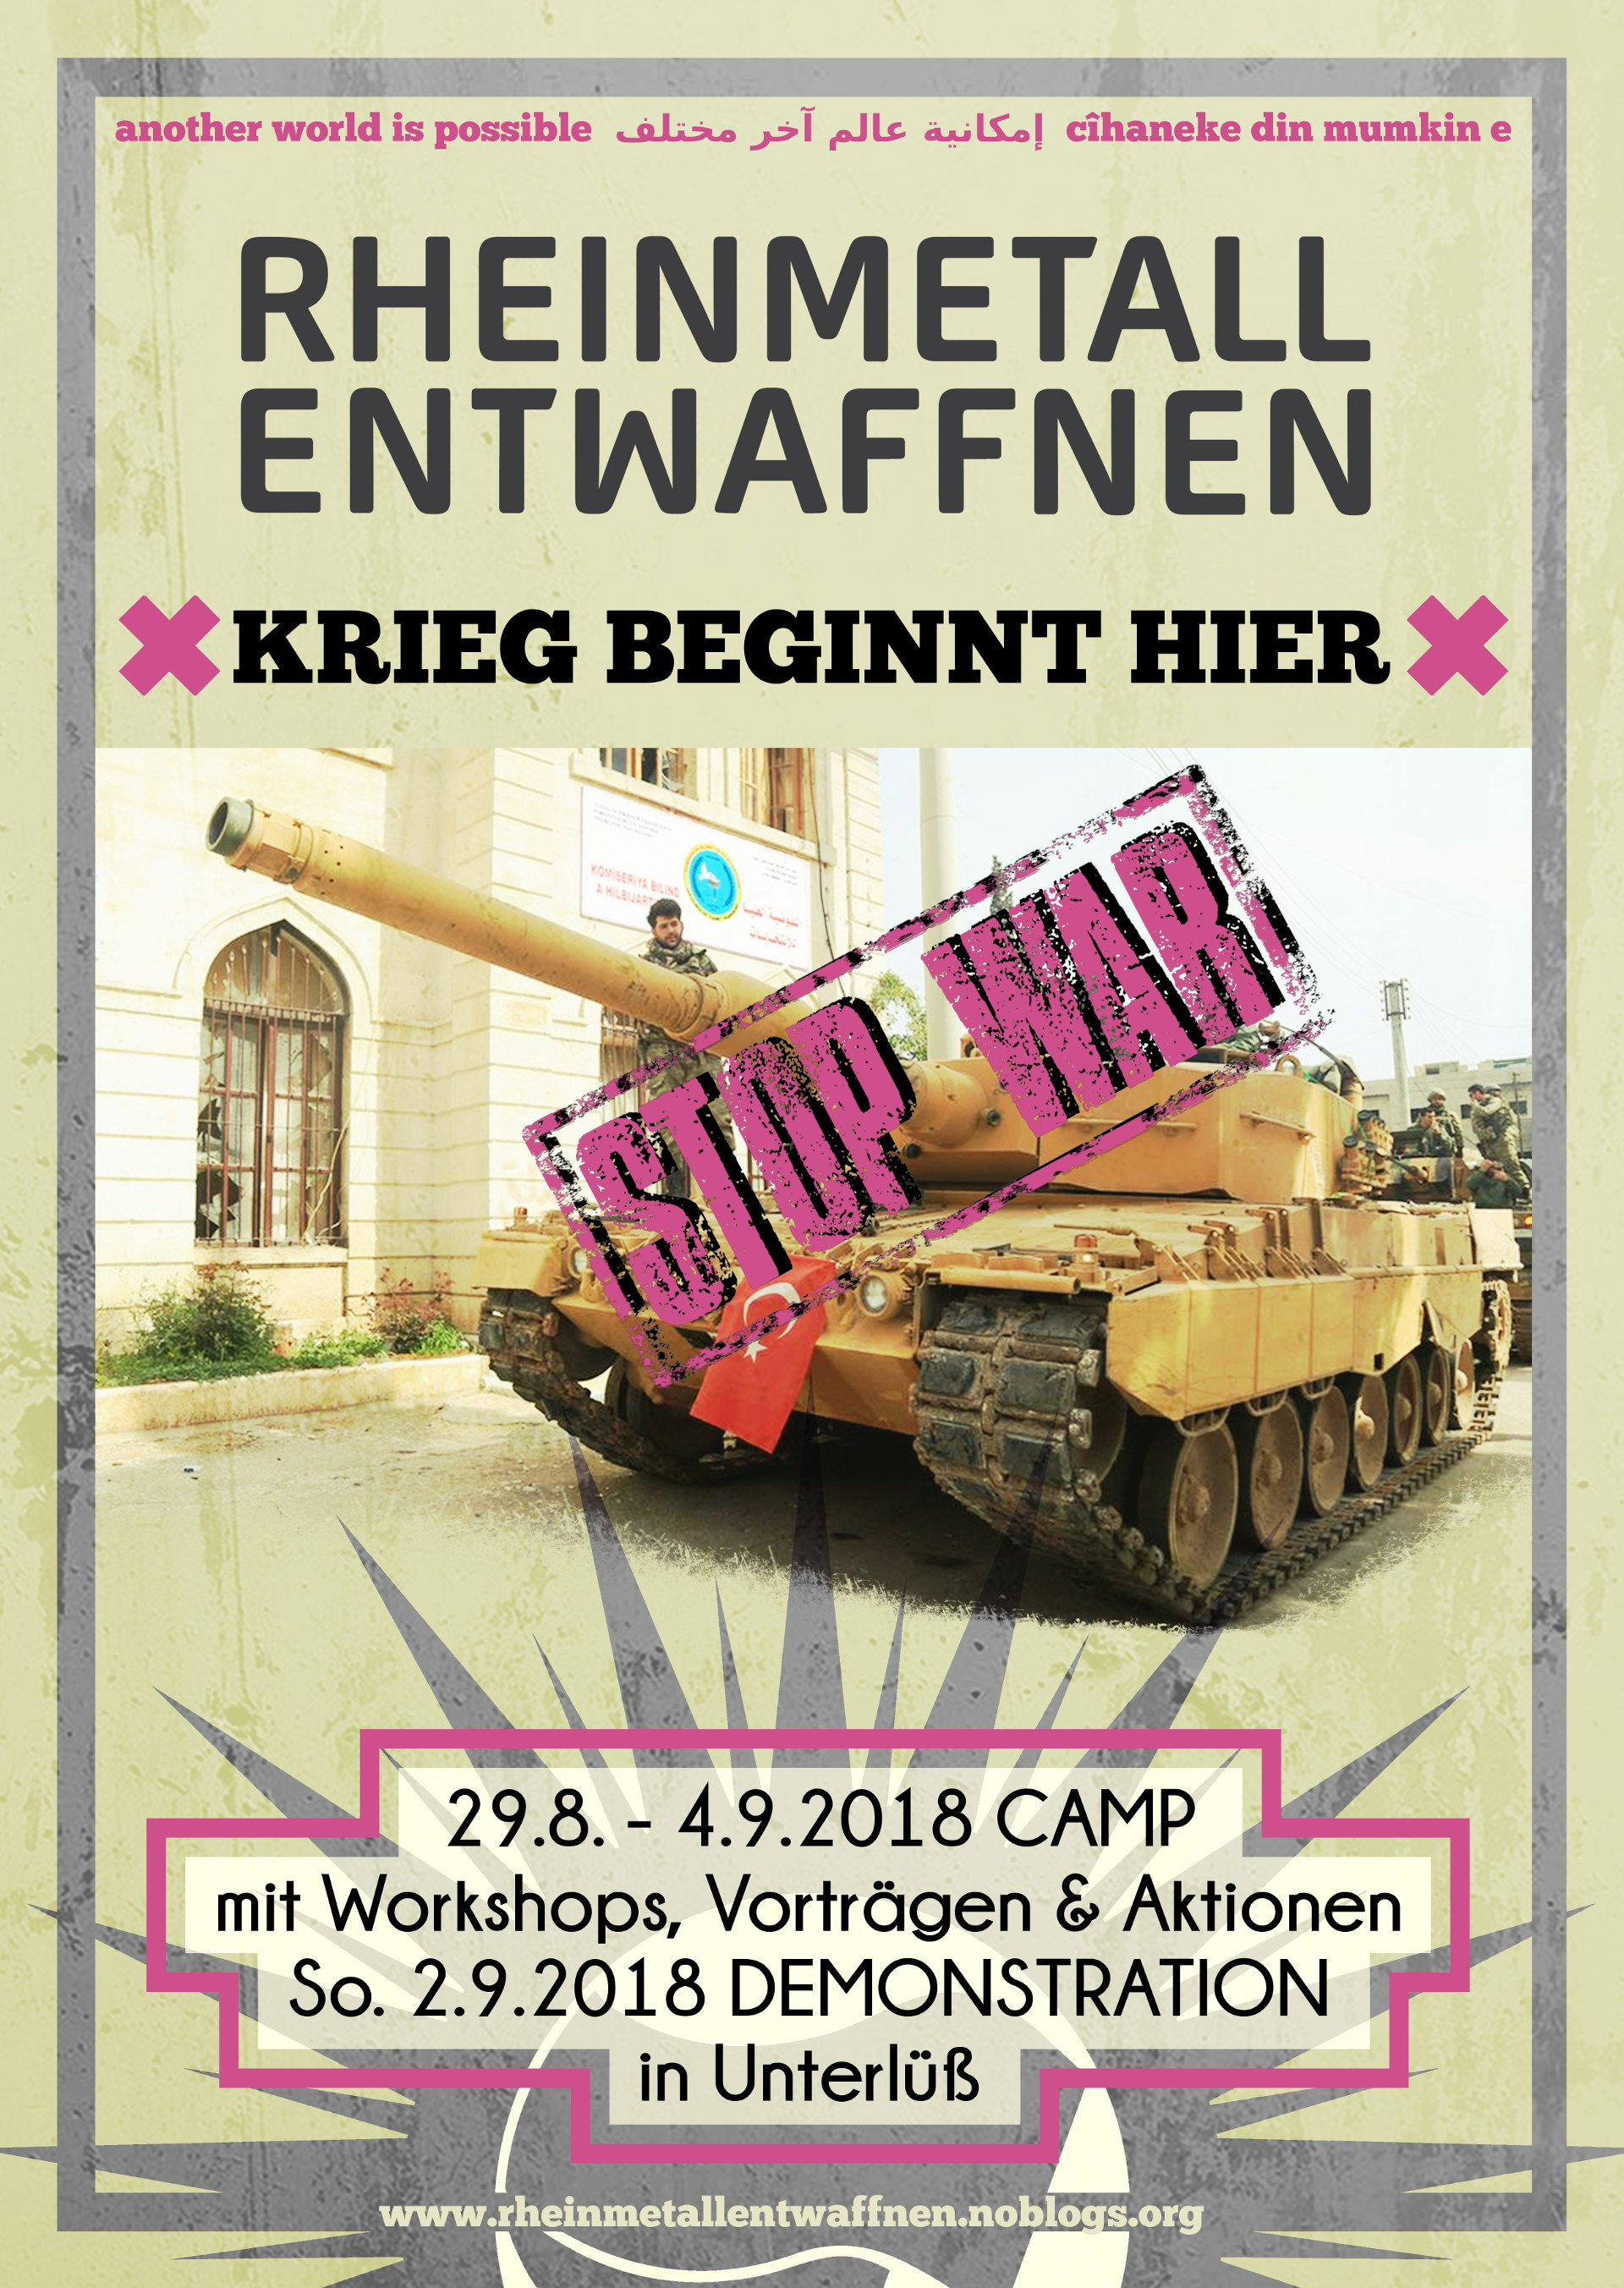 Rheinmetall entwaffnen